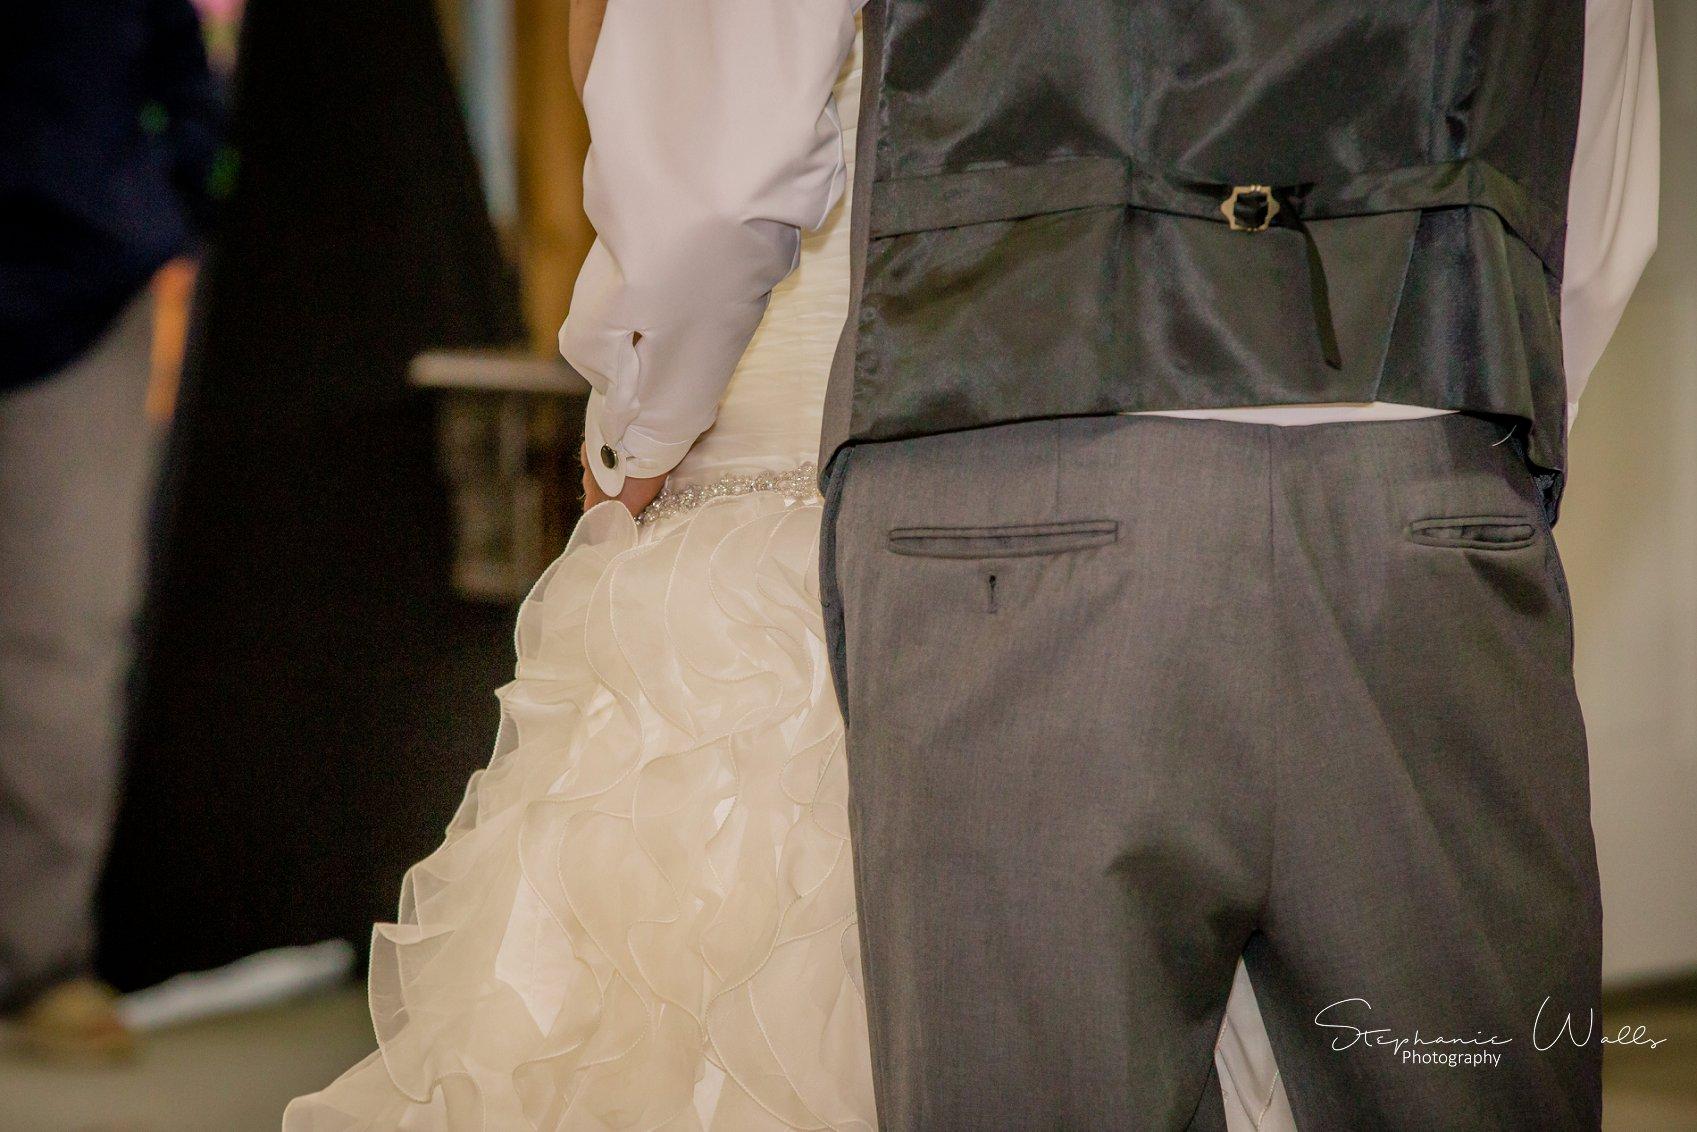 Kimble Wedding 025 Marlena & Allans | Snohomish Red Barn Events (Stocker Farms) | Snohomish, Wa Wedding Photographer